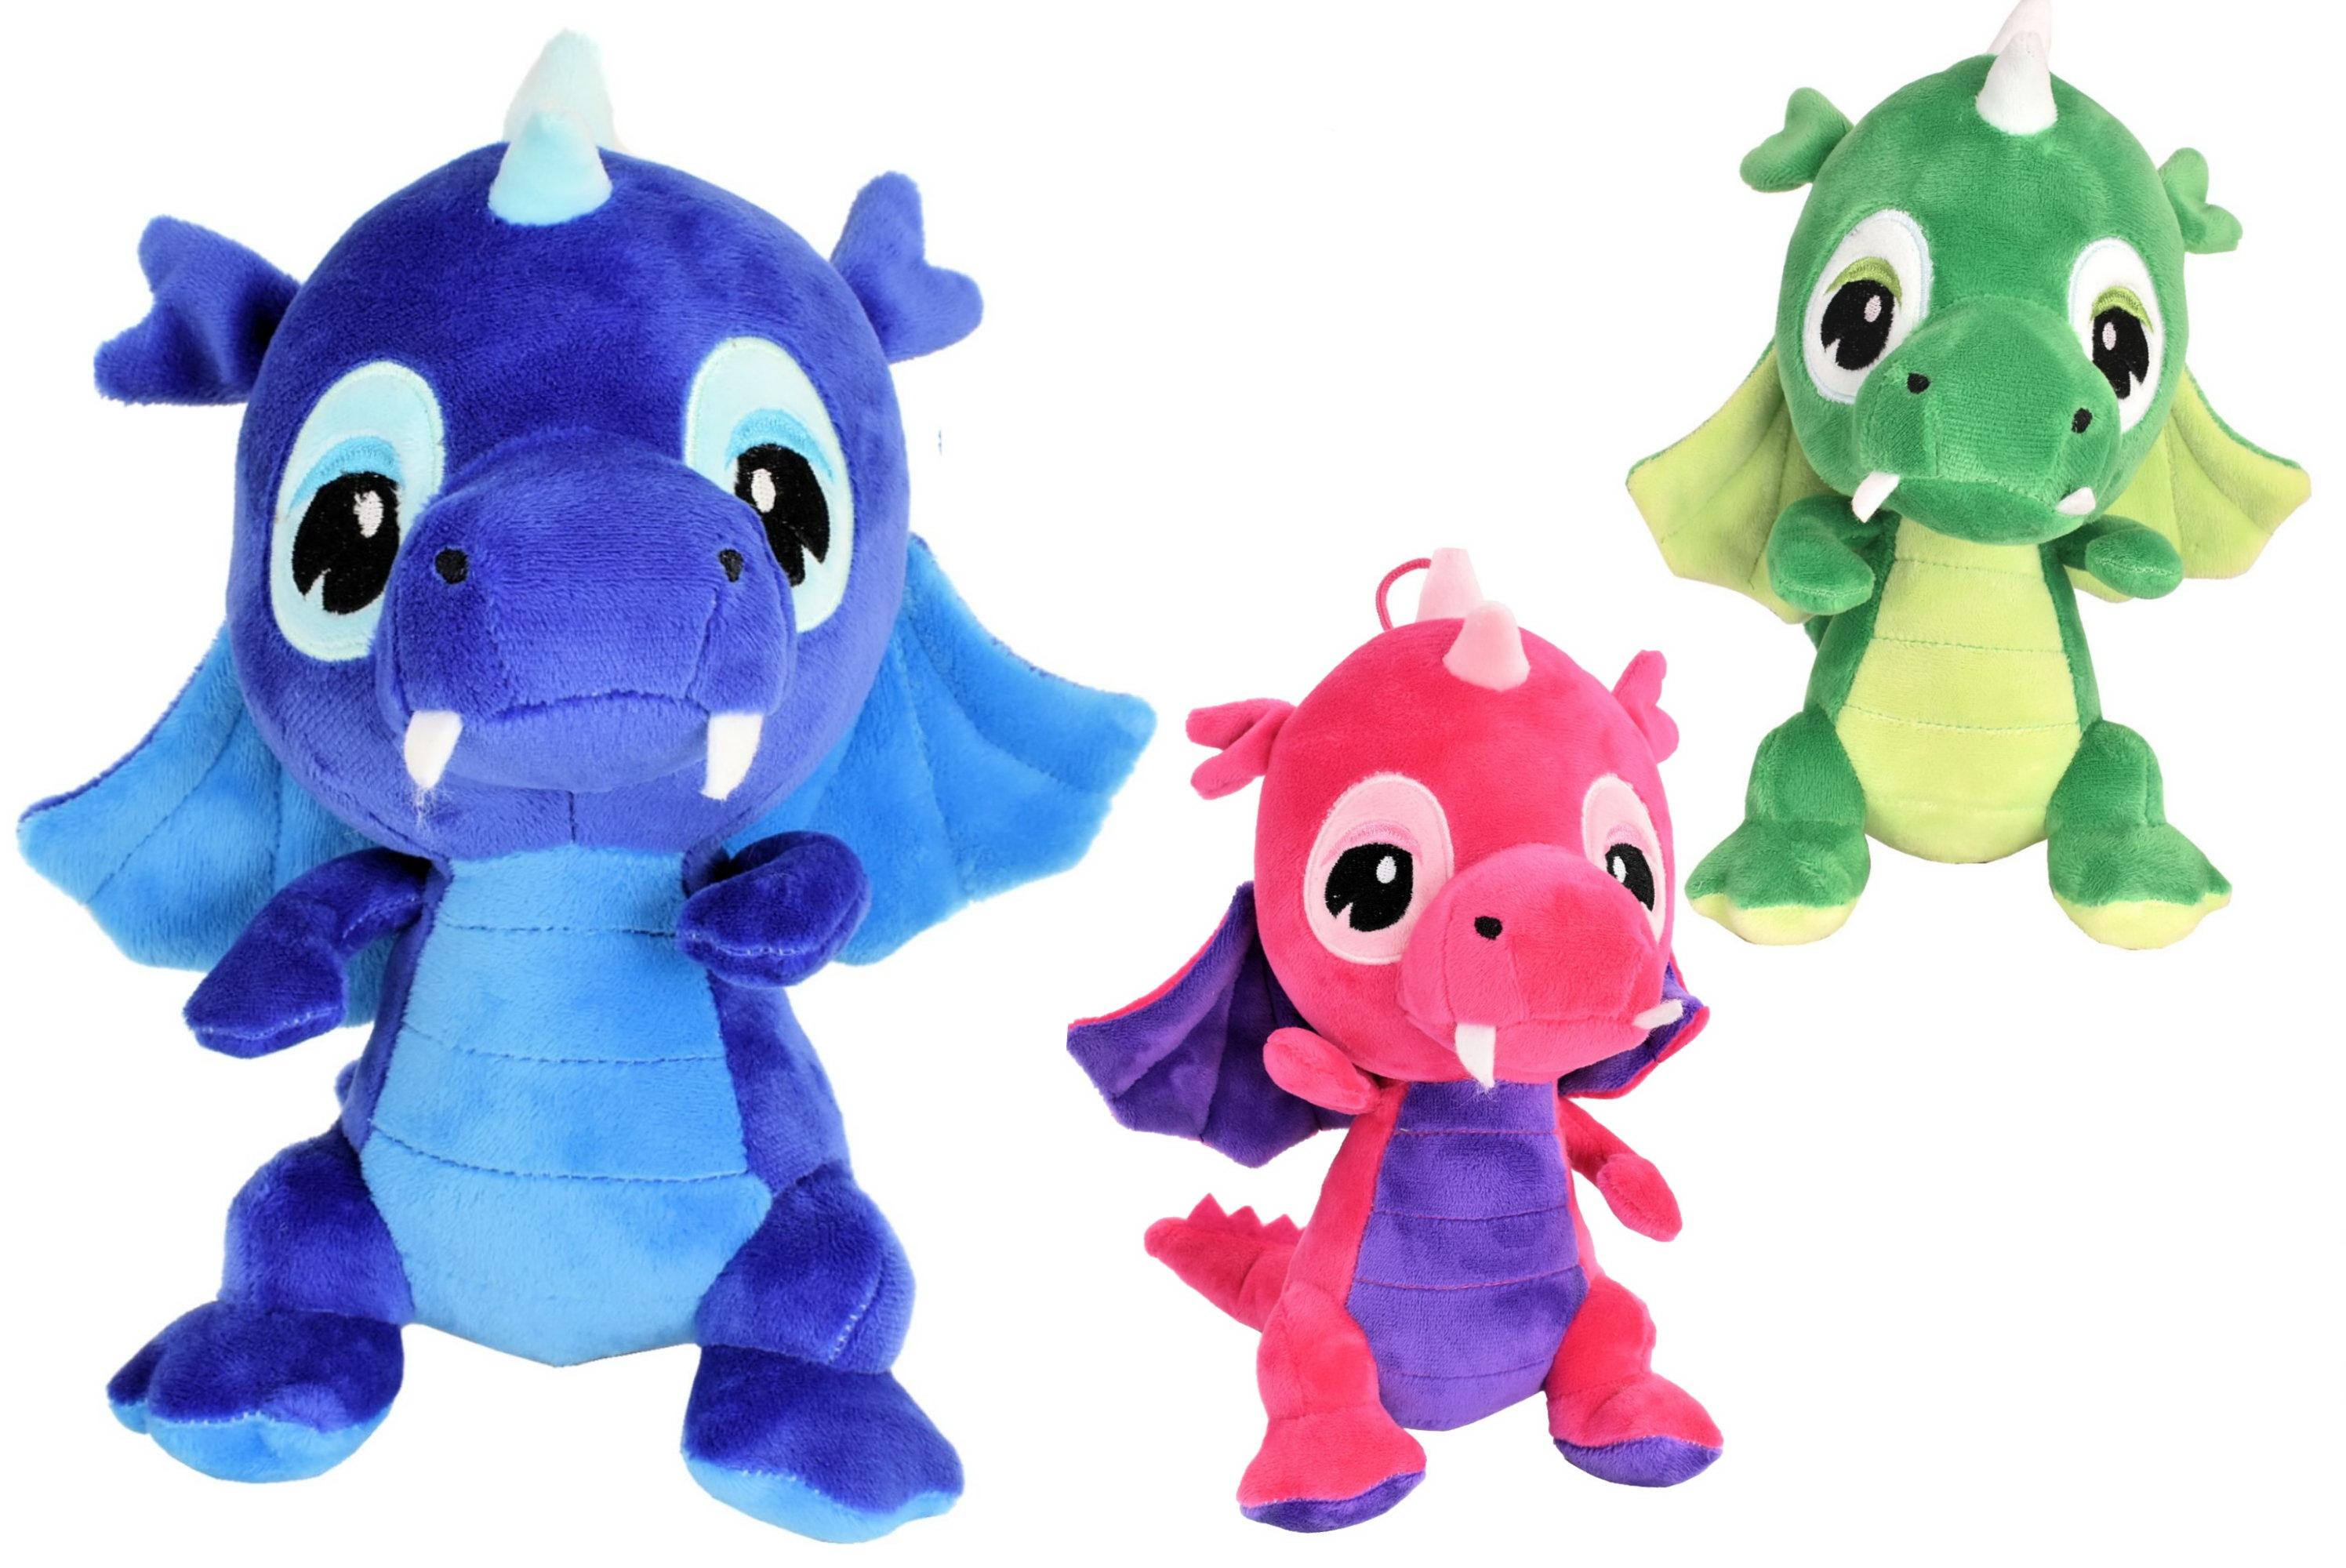 20cm Plush Dragons - 3 Asssorted Colours